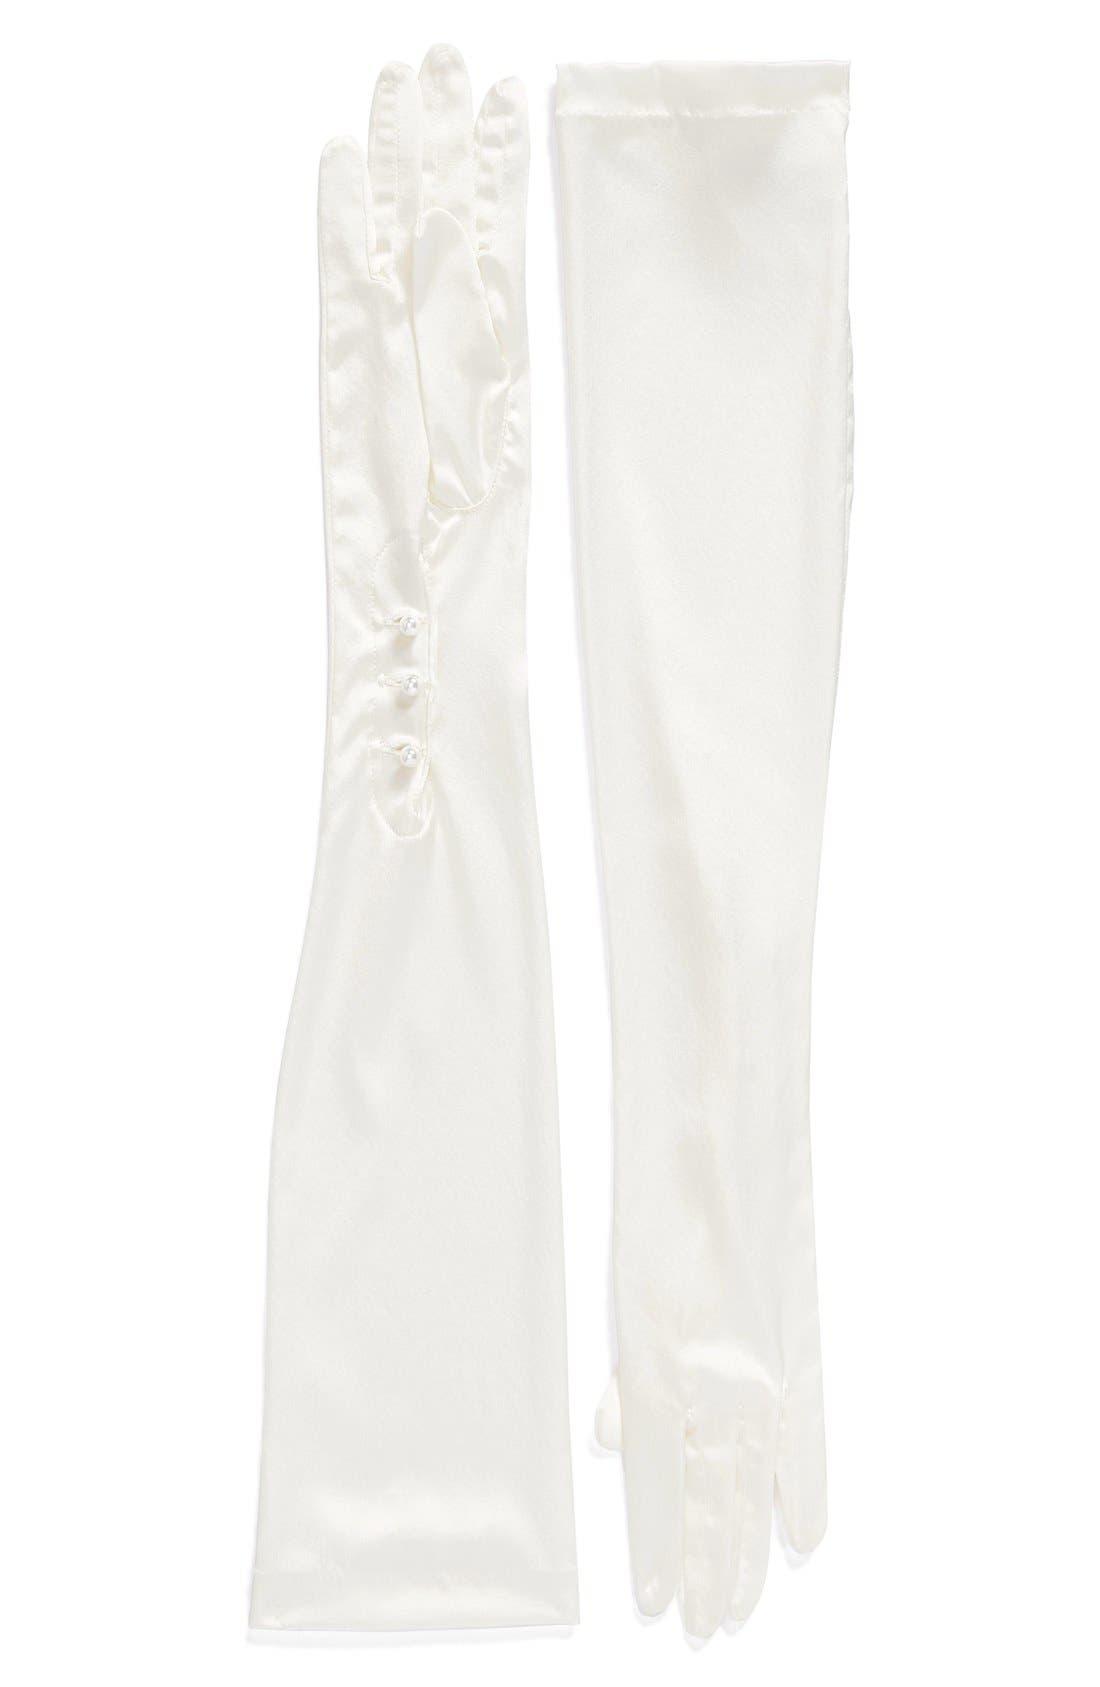 CAROLINA AMATO Opera Length Mousquetaire Stretch Silk Gloves